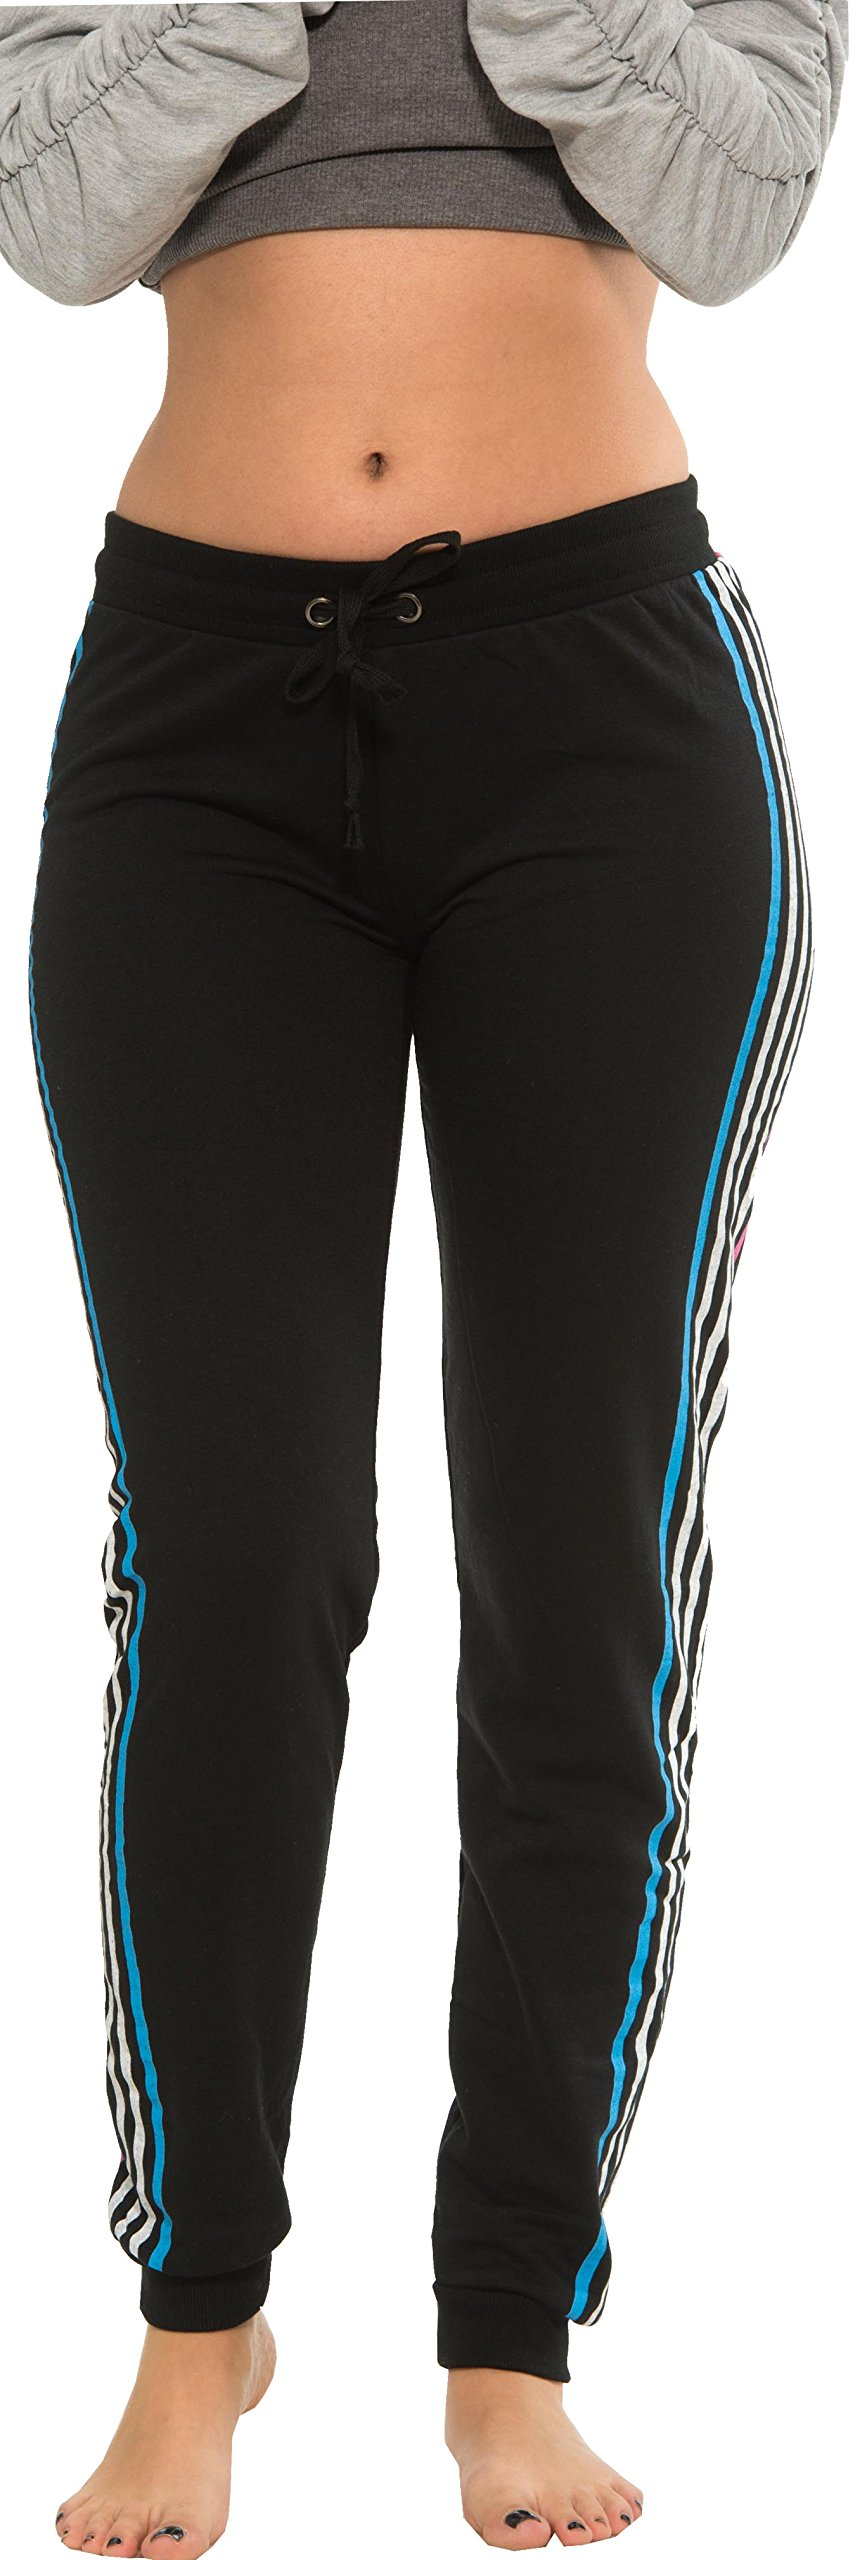 Coco-Limon Women Regular & Plus-Size Jogger Sweatpants , Multi-Striped Leg,1X,Black